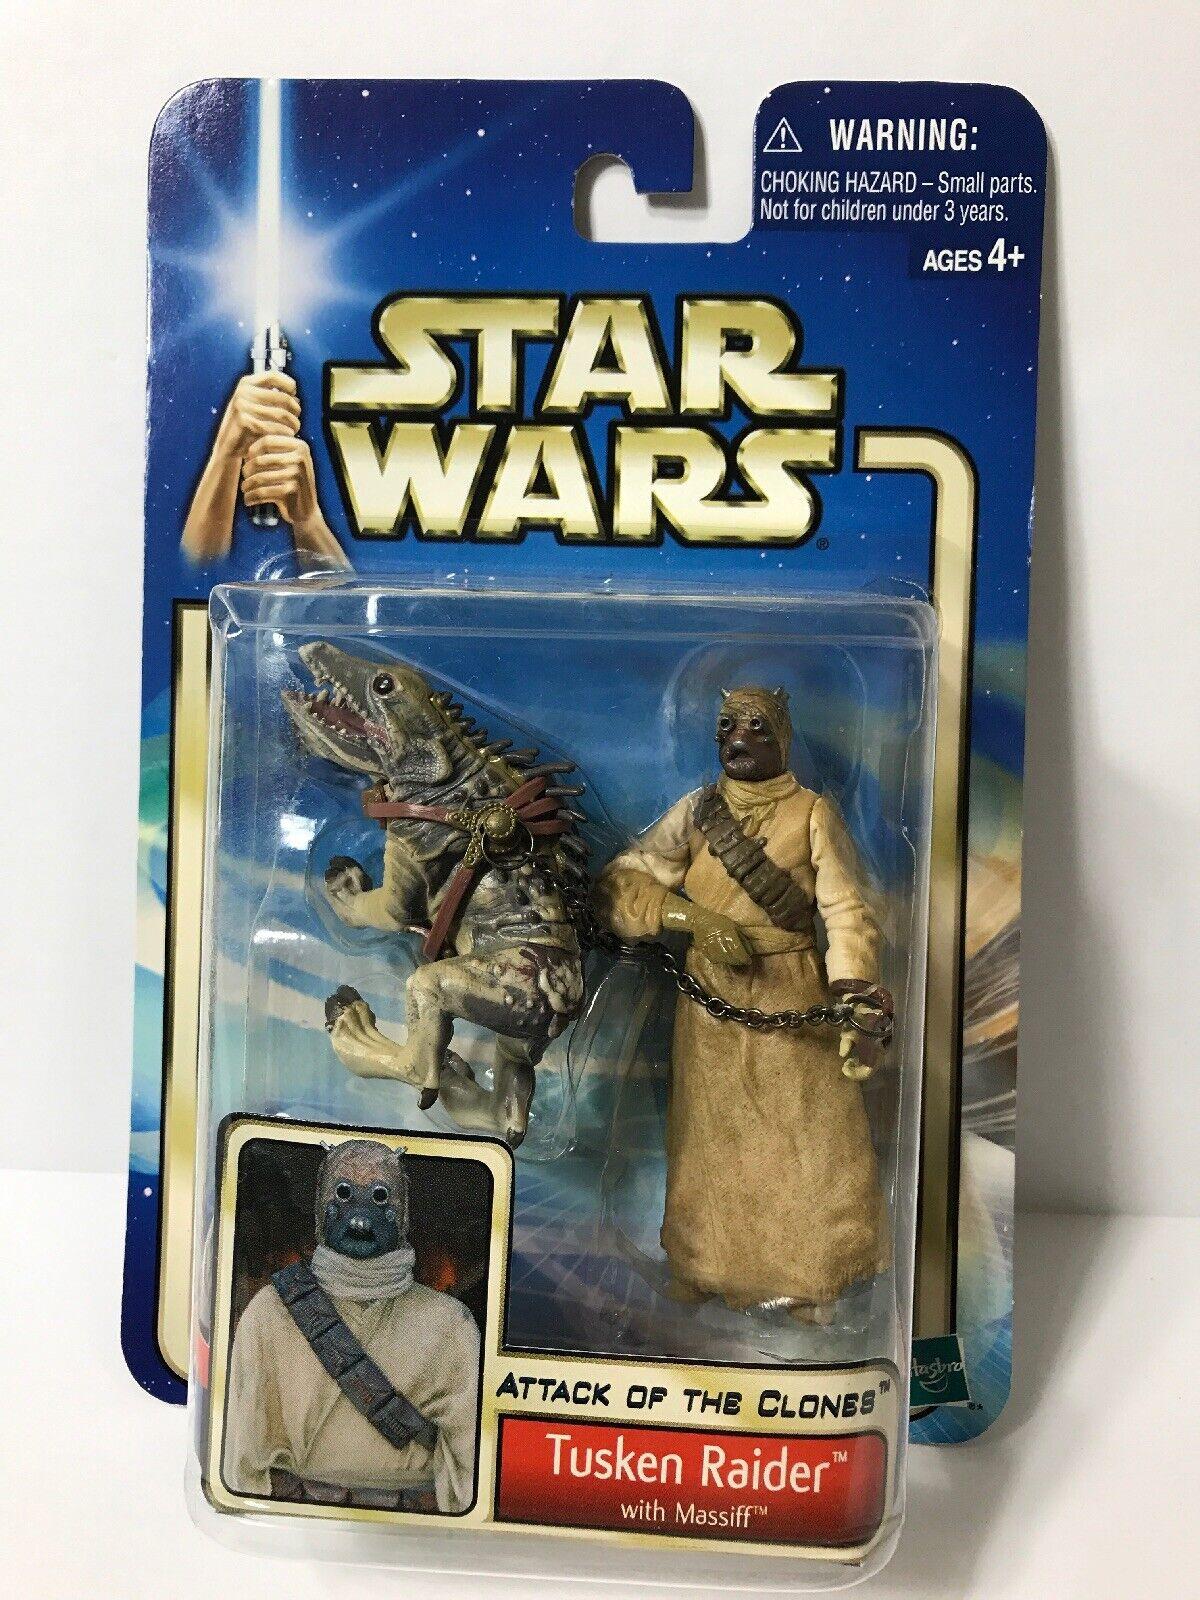 attaque des clones/'02 #52 Hasbro Star Wars Tusken Raider avec massiff